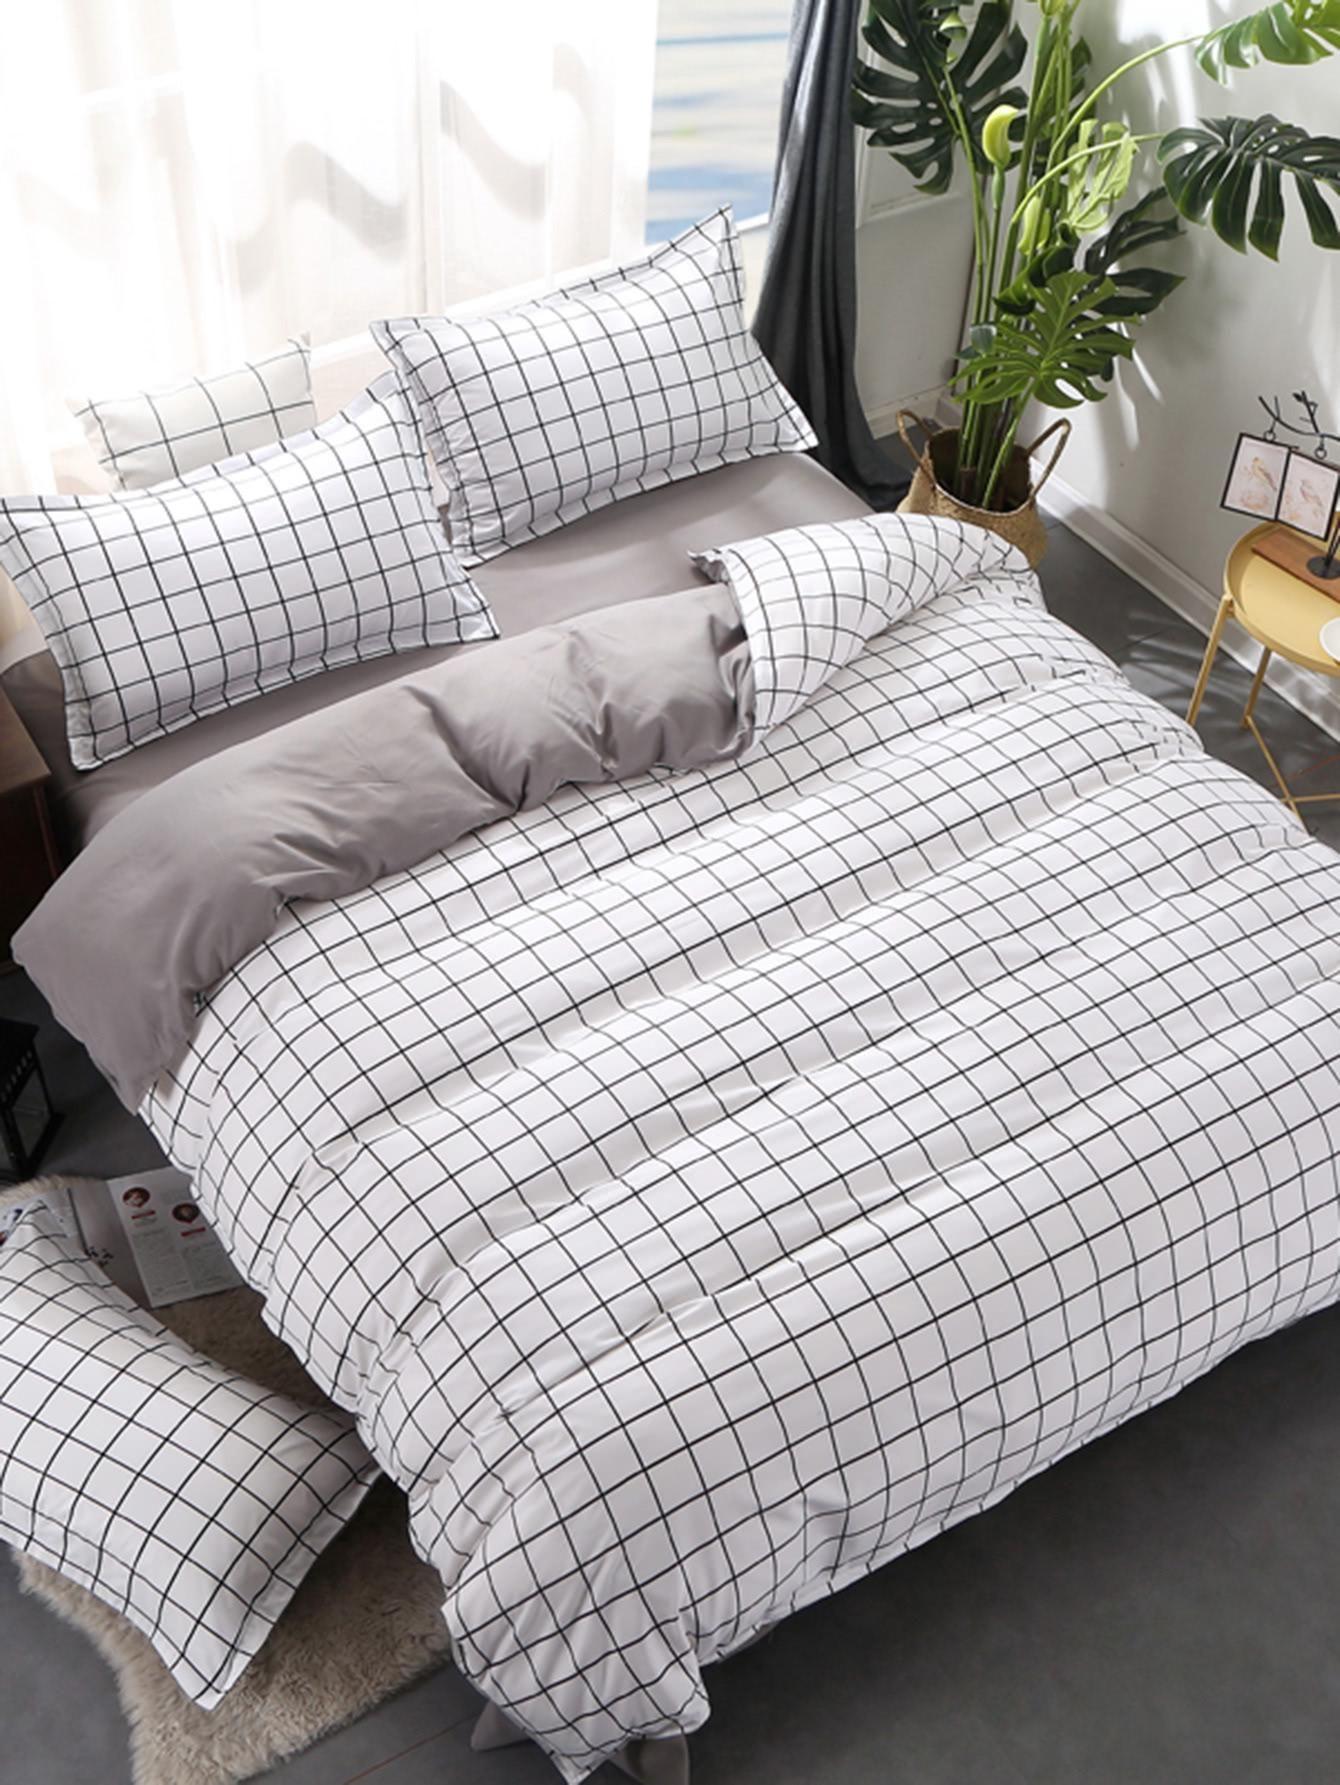 Valentines Adorewe Romwe Romwe 2 0m 4pcs Grid Duvet Cover Set Adorewe Com Bed Linens Luxury Room Ideas Bedroom Aesthetic Bedroom